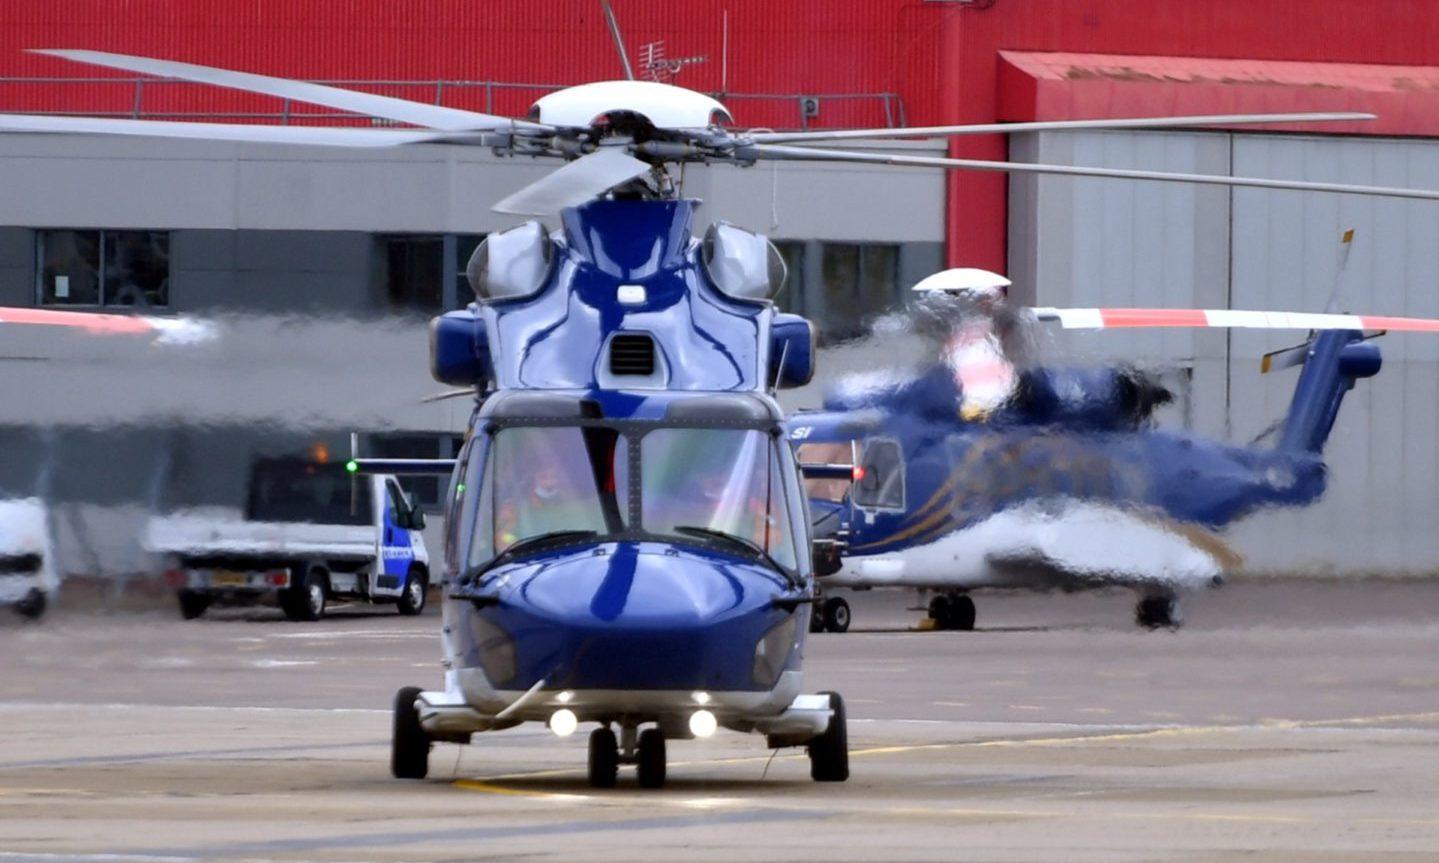 Helicopter owner Babcock's £1.6bn loss causes shares to tumbleCalendarCancelCaretEmailFacebookGoogleLinked InLogoutProfileTelephoneTickIs PublicIs Not PublicFolderBreakingCameraCaretClockCloseCommentEllipsisEnvelopeFacebookCameraHomeInstagramLinked InMagnifying GlassMenuNextNoticePreviousRatingTagTwitterVideo CameraDCT Media Logo